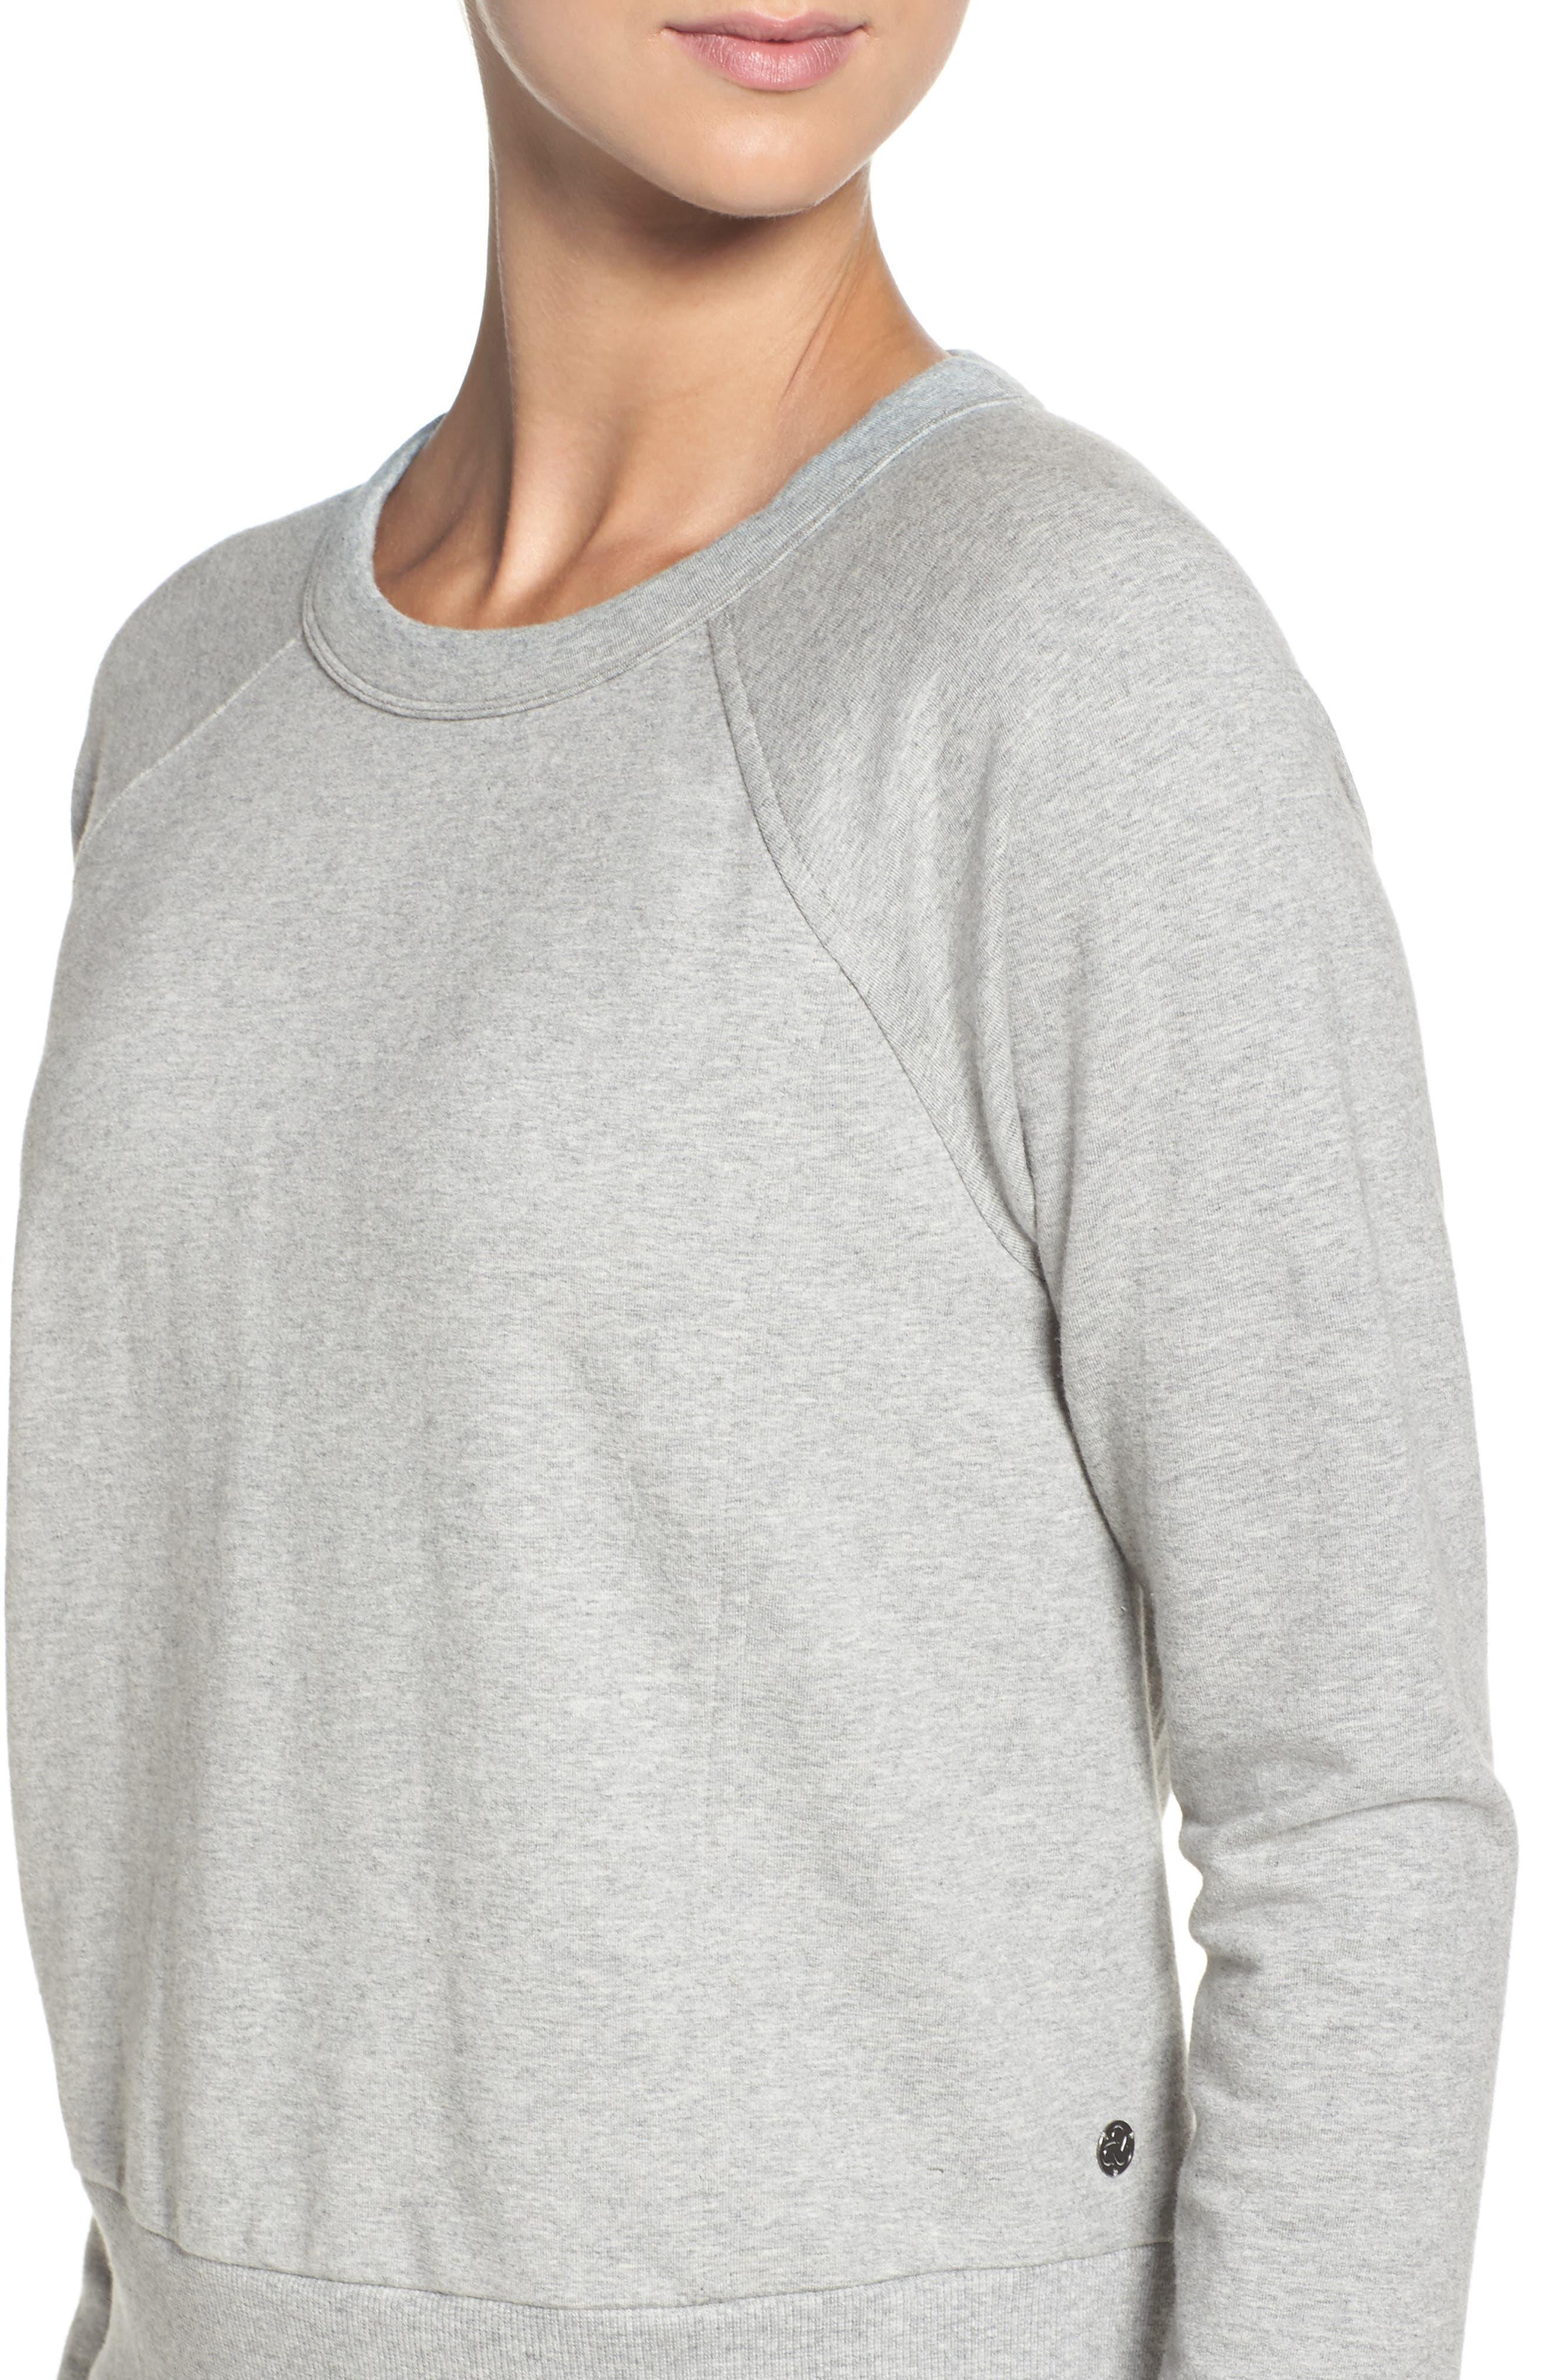 Covet Crisscross Sweatshirt,                             Alternate thumbnail 9, color,